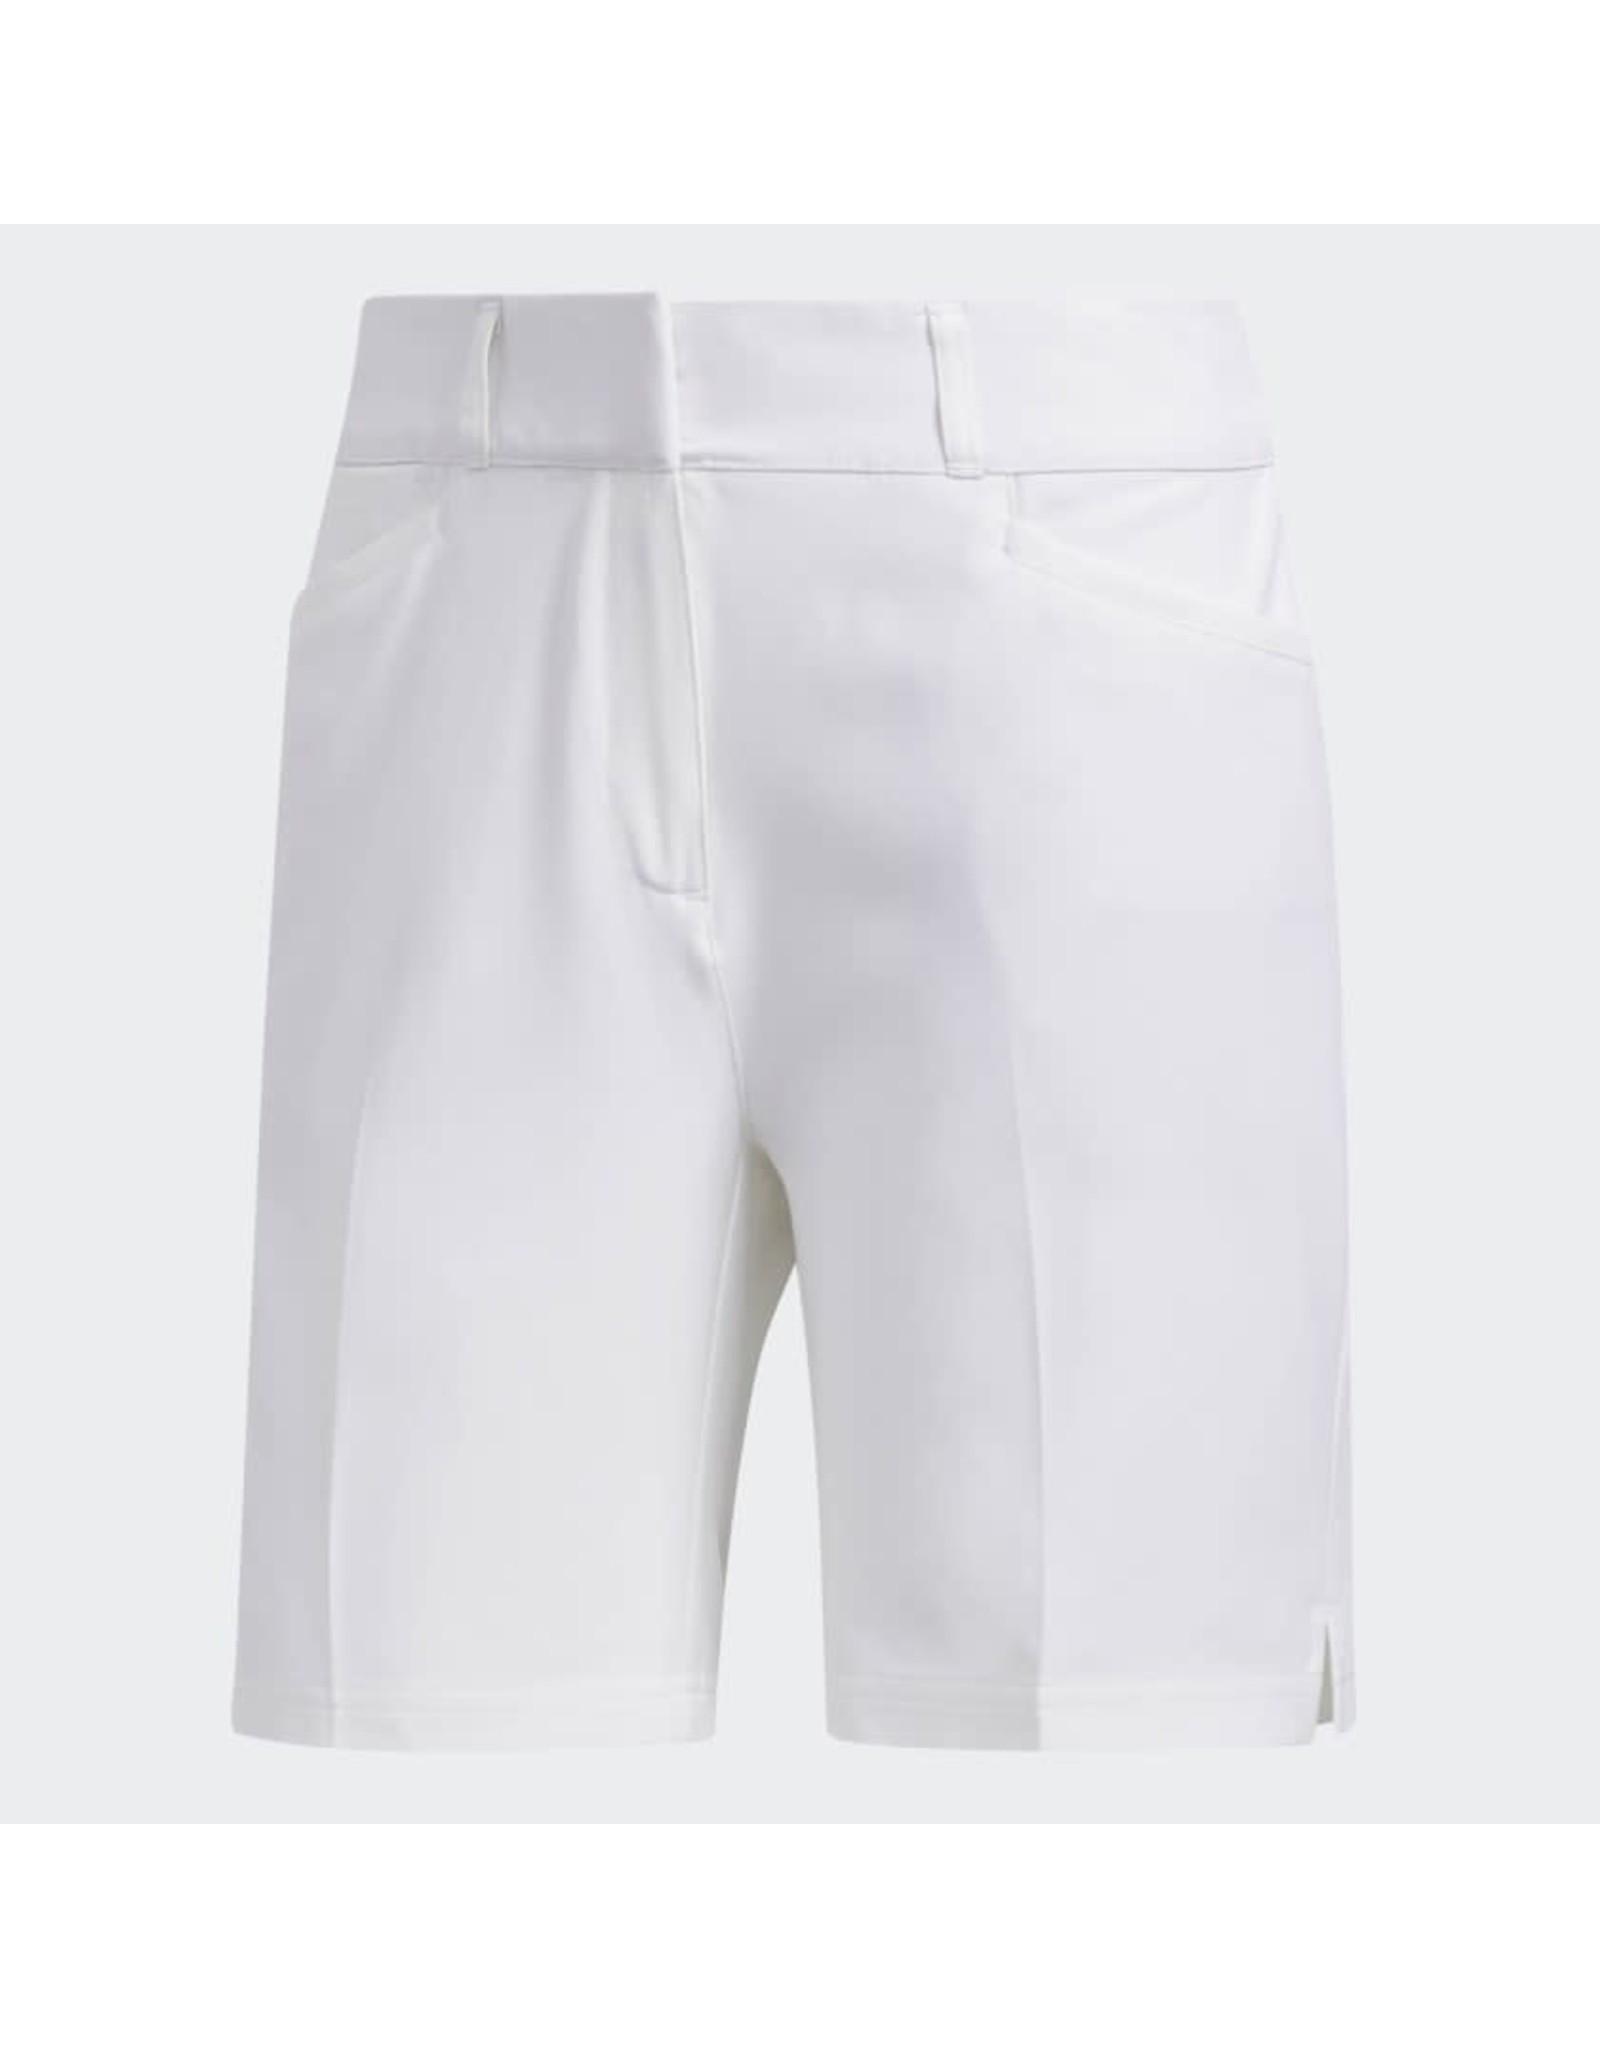 Adidas Adidas Women's Shorts (DQ 2143)